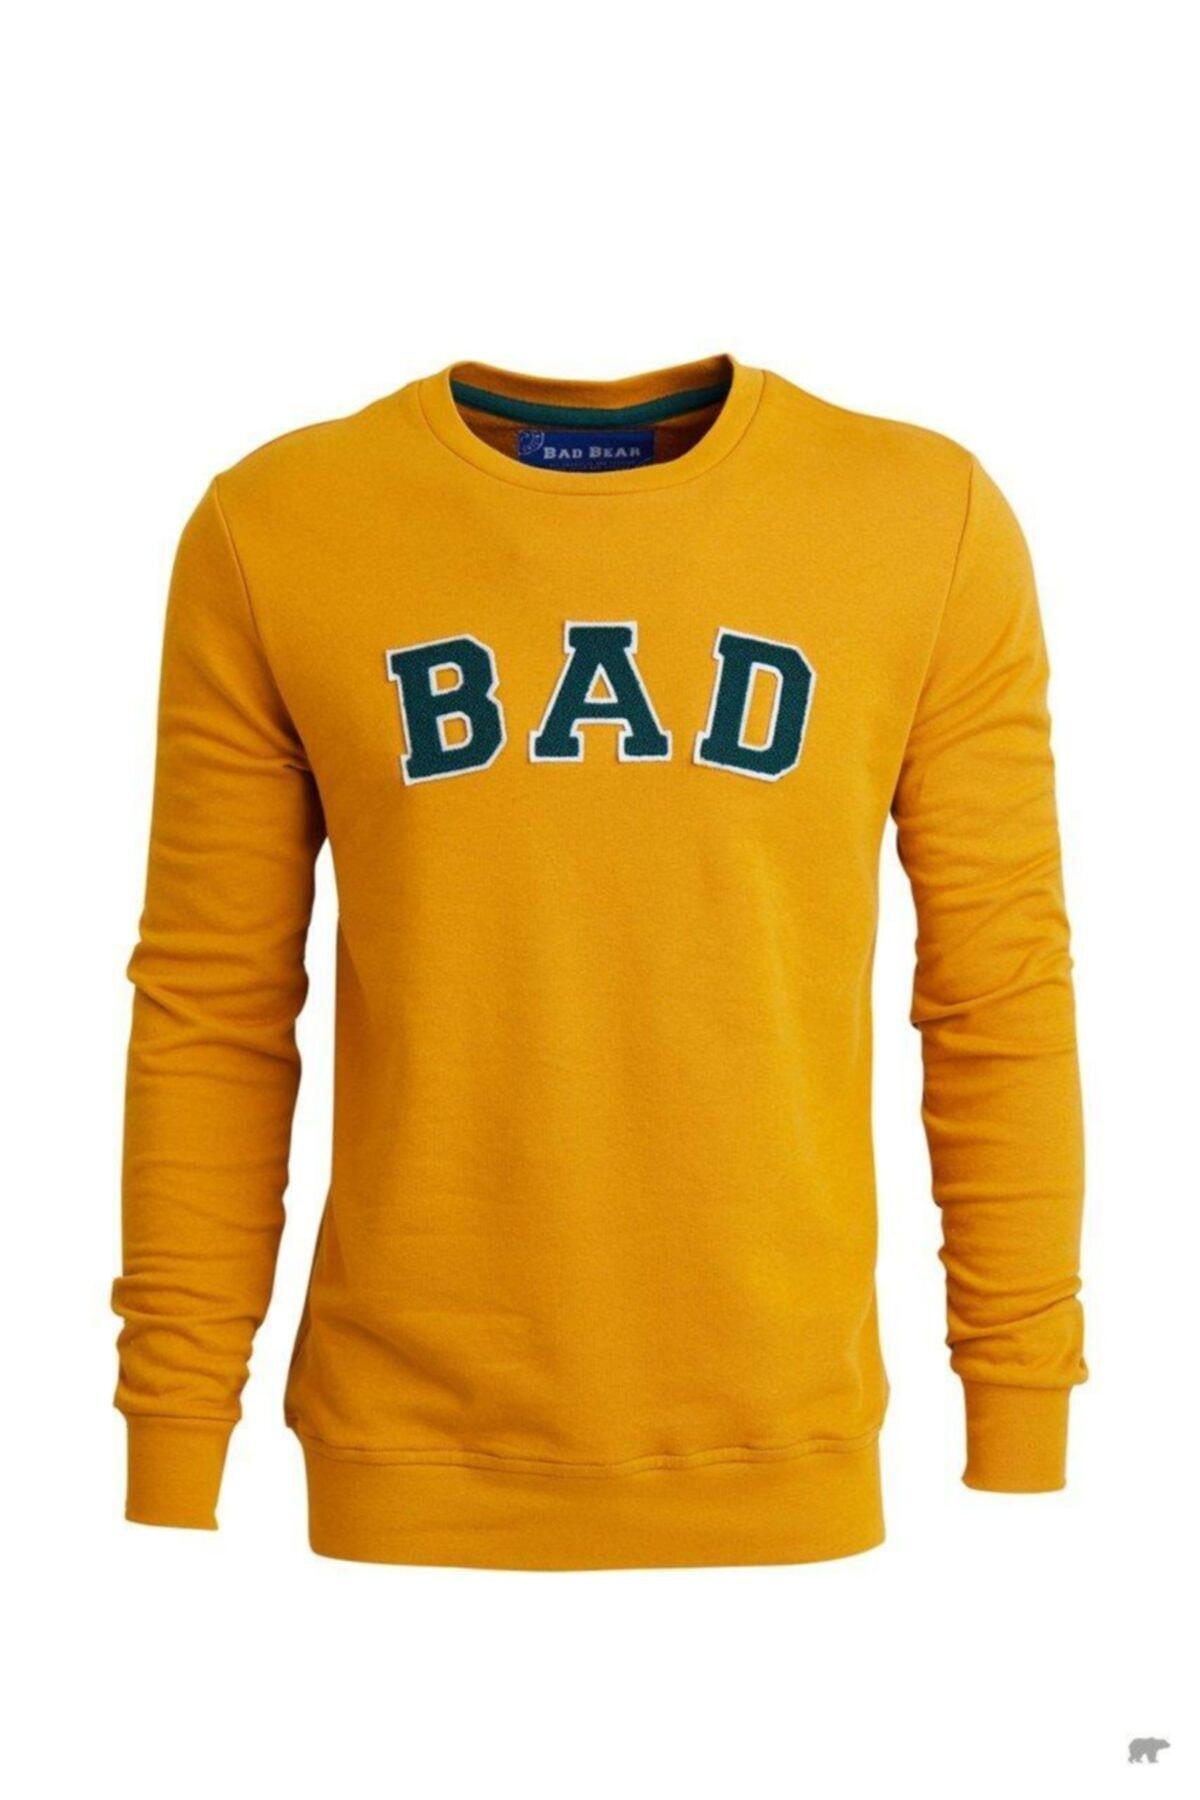 Bad Bear Bad Convex Erkek Sweatshirt 190212003-c25 1